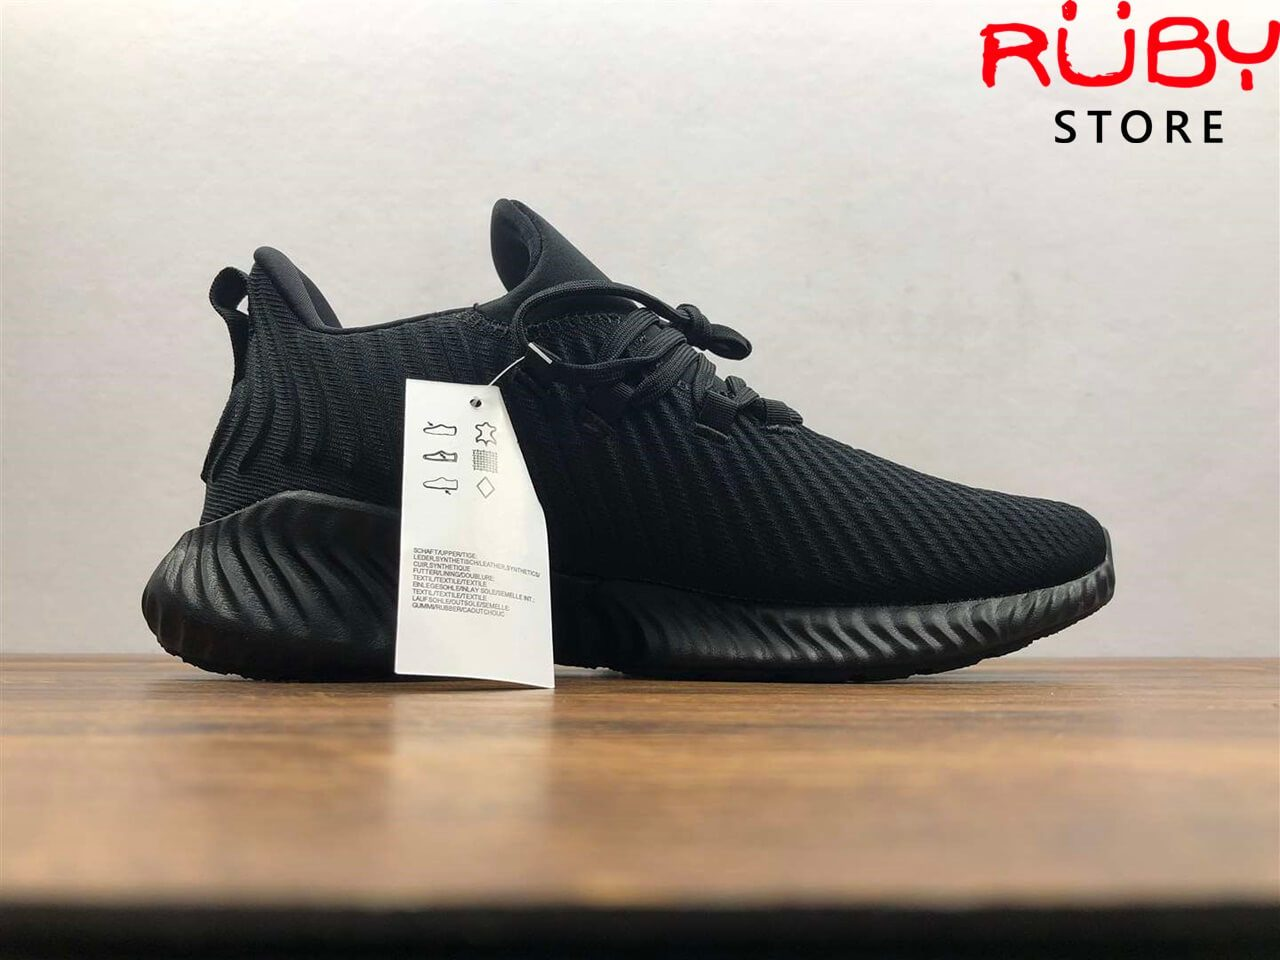 giày-alphabounce-instinct-đen-full-replica-11-ở-hcm (2)